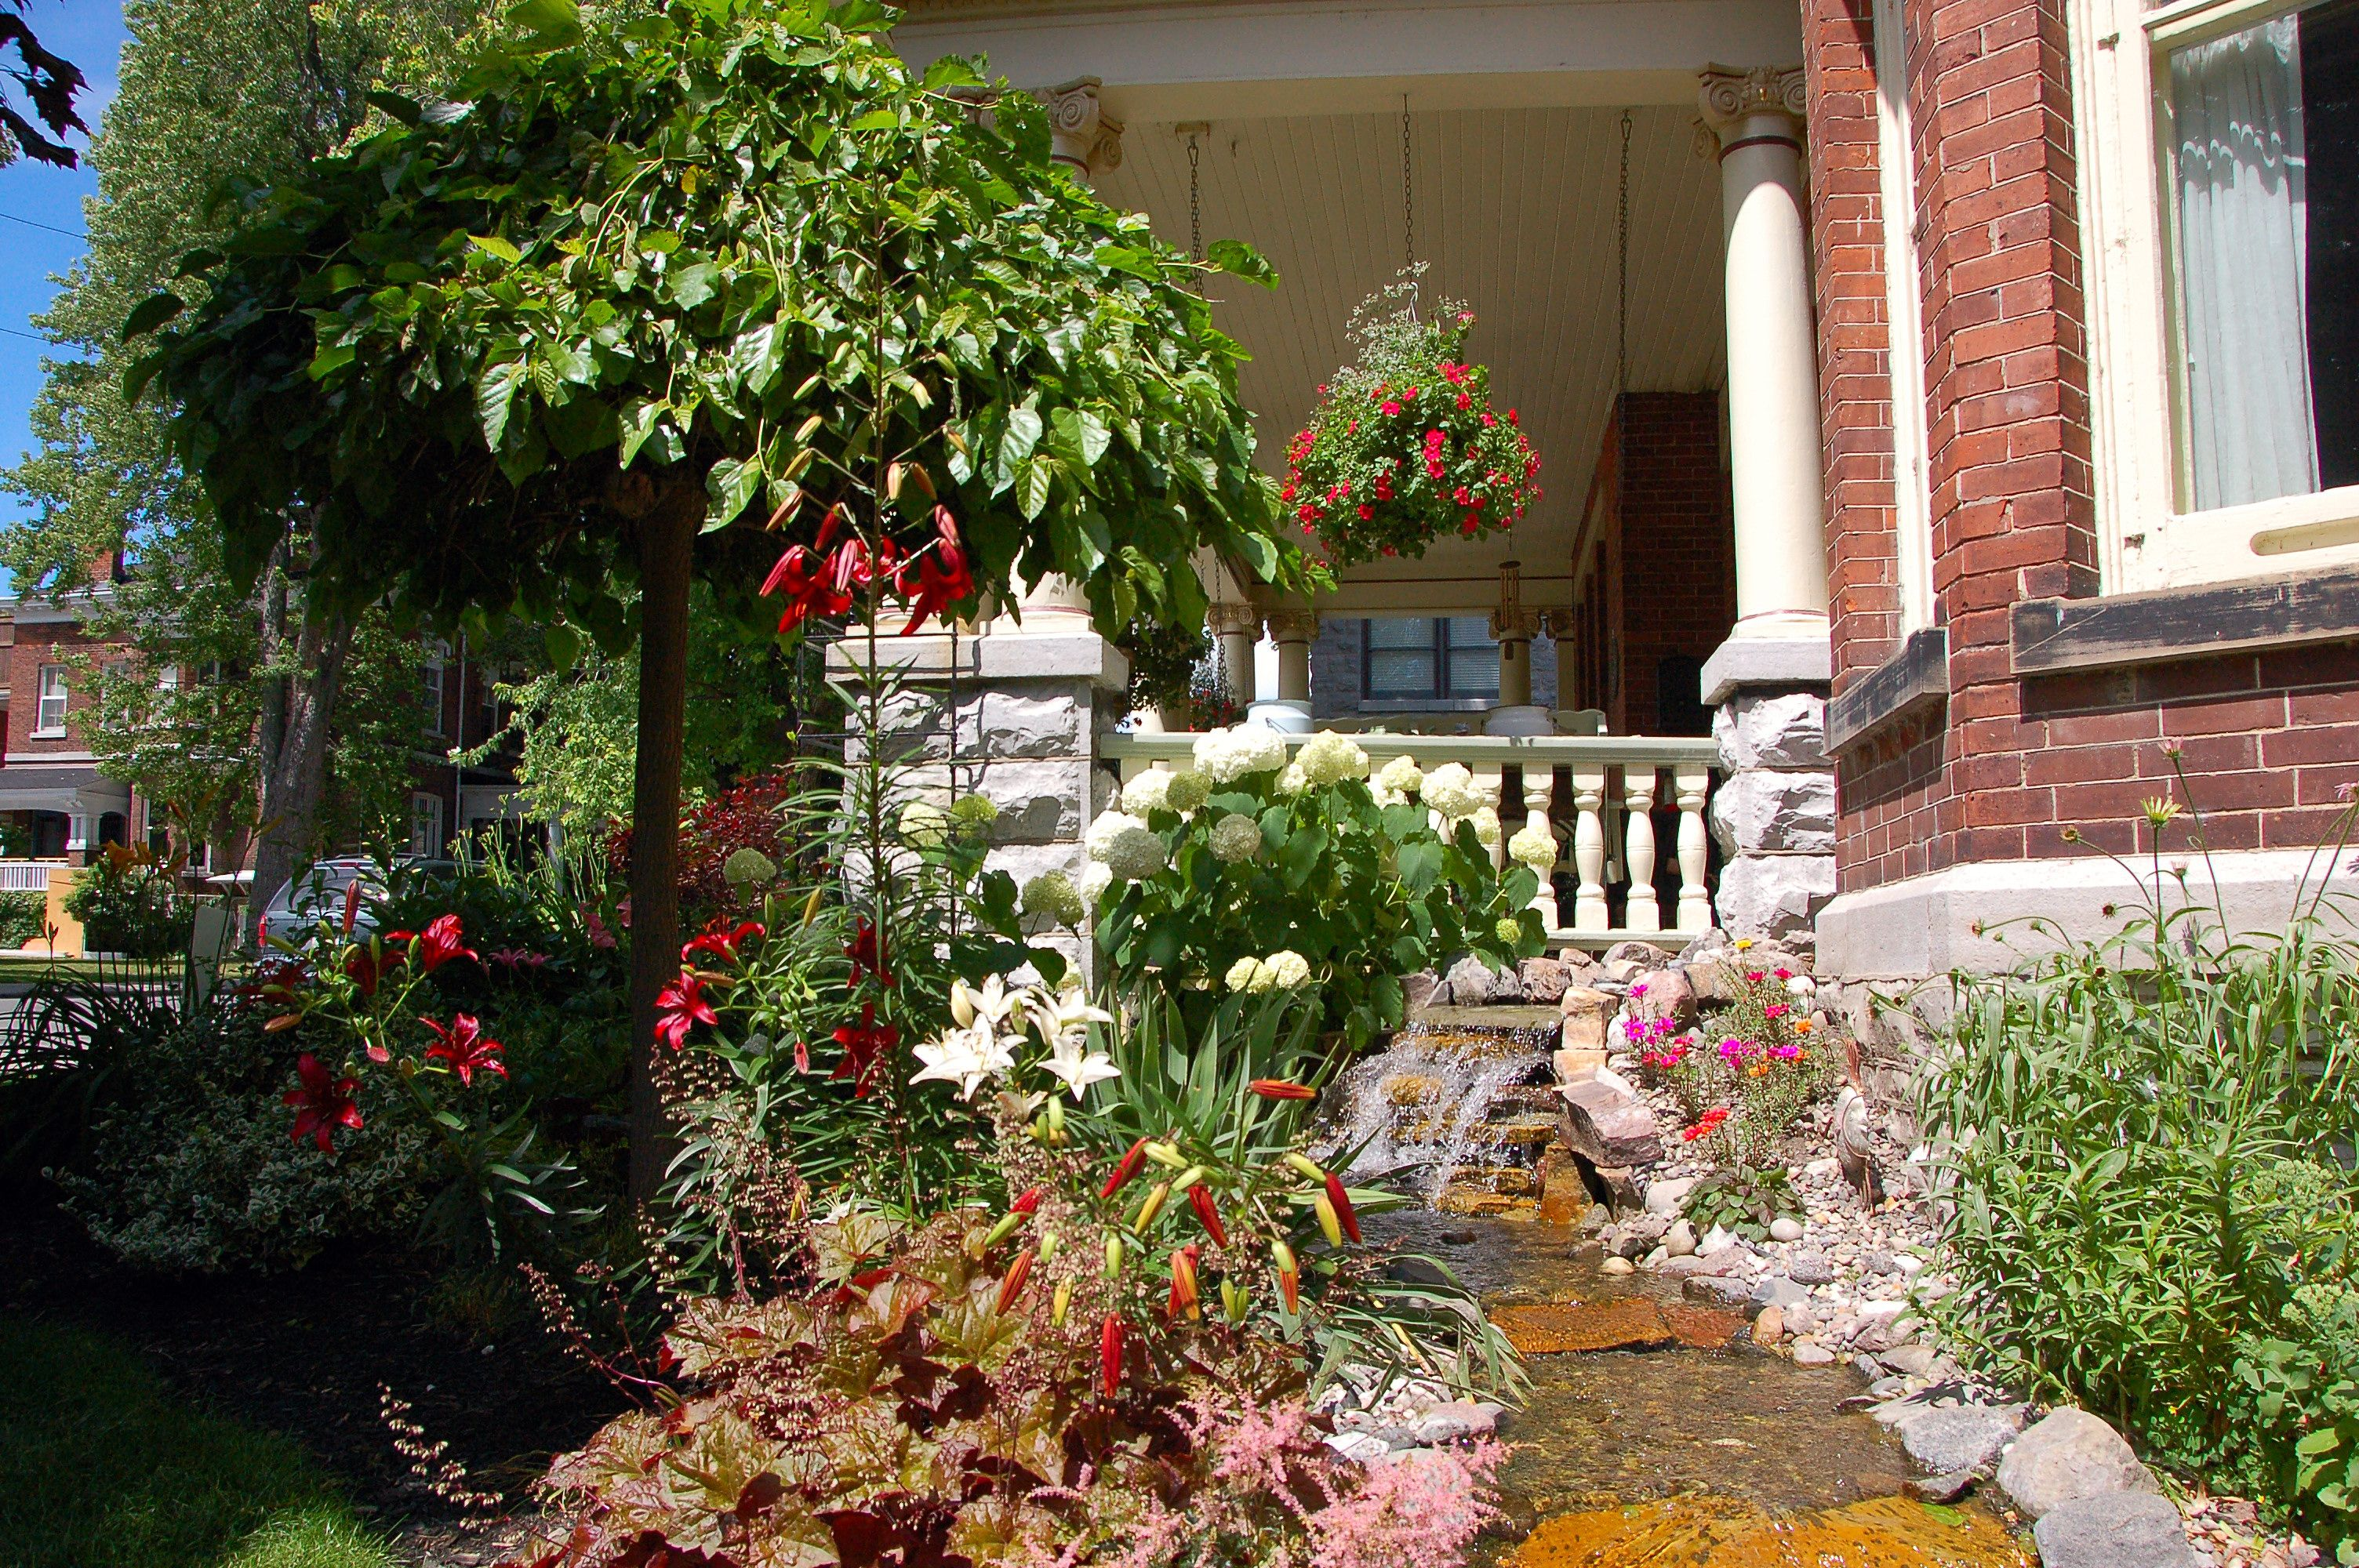 Secret Garden Bed And Breakfast Kingston Ontario Garden Beds Garden Landscape Architecture